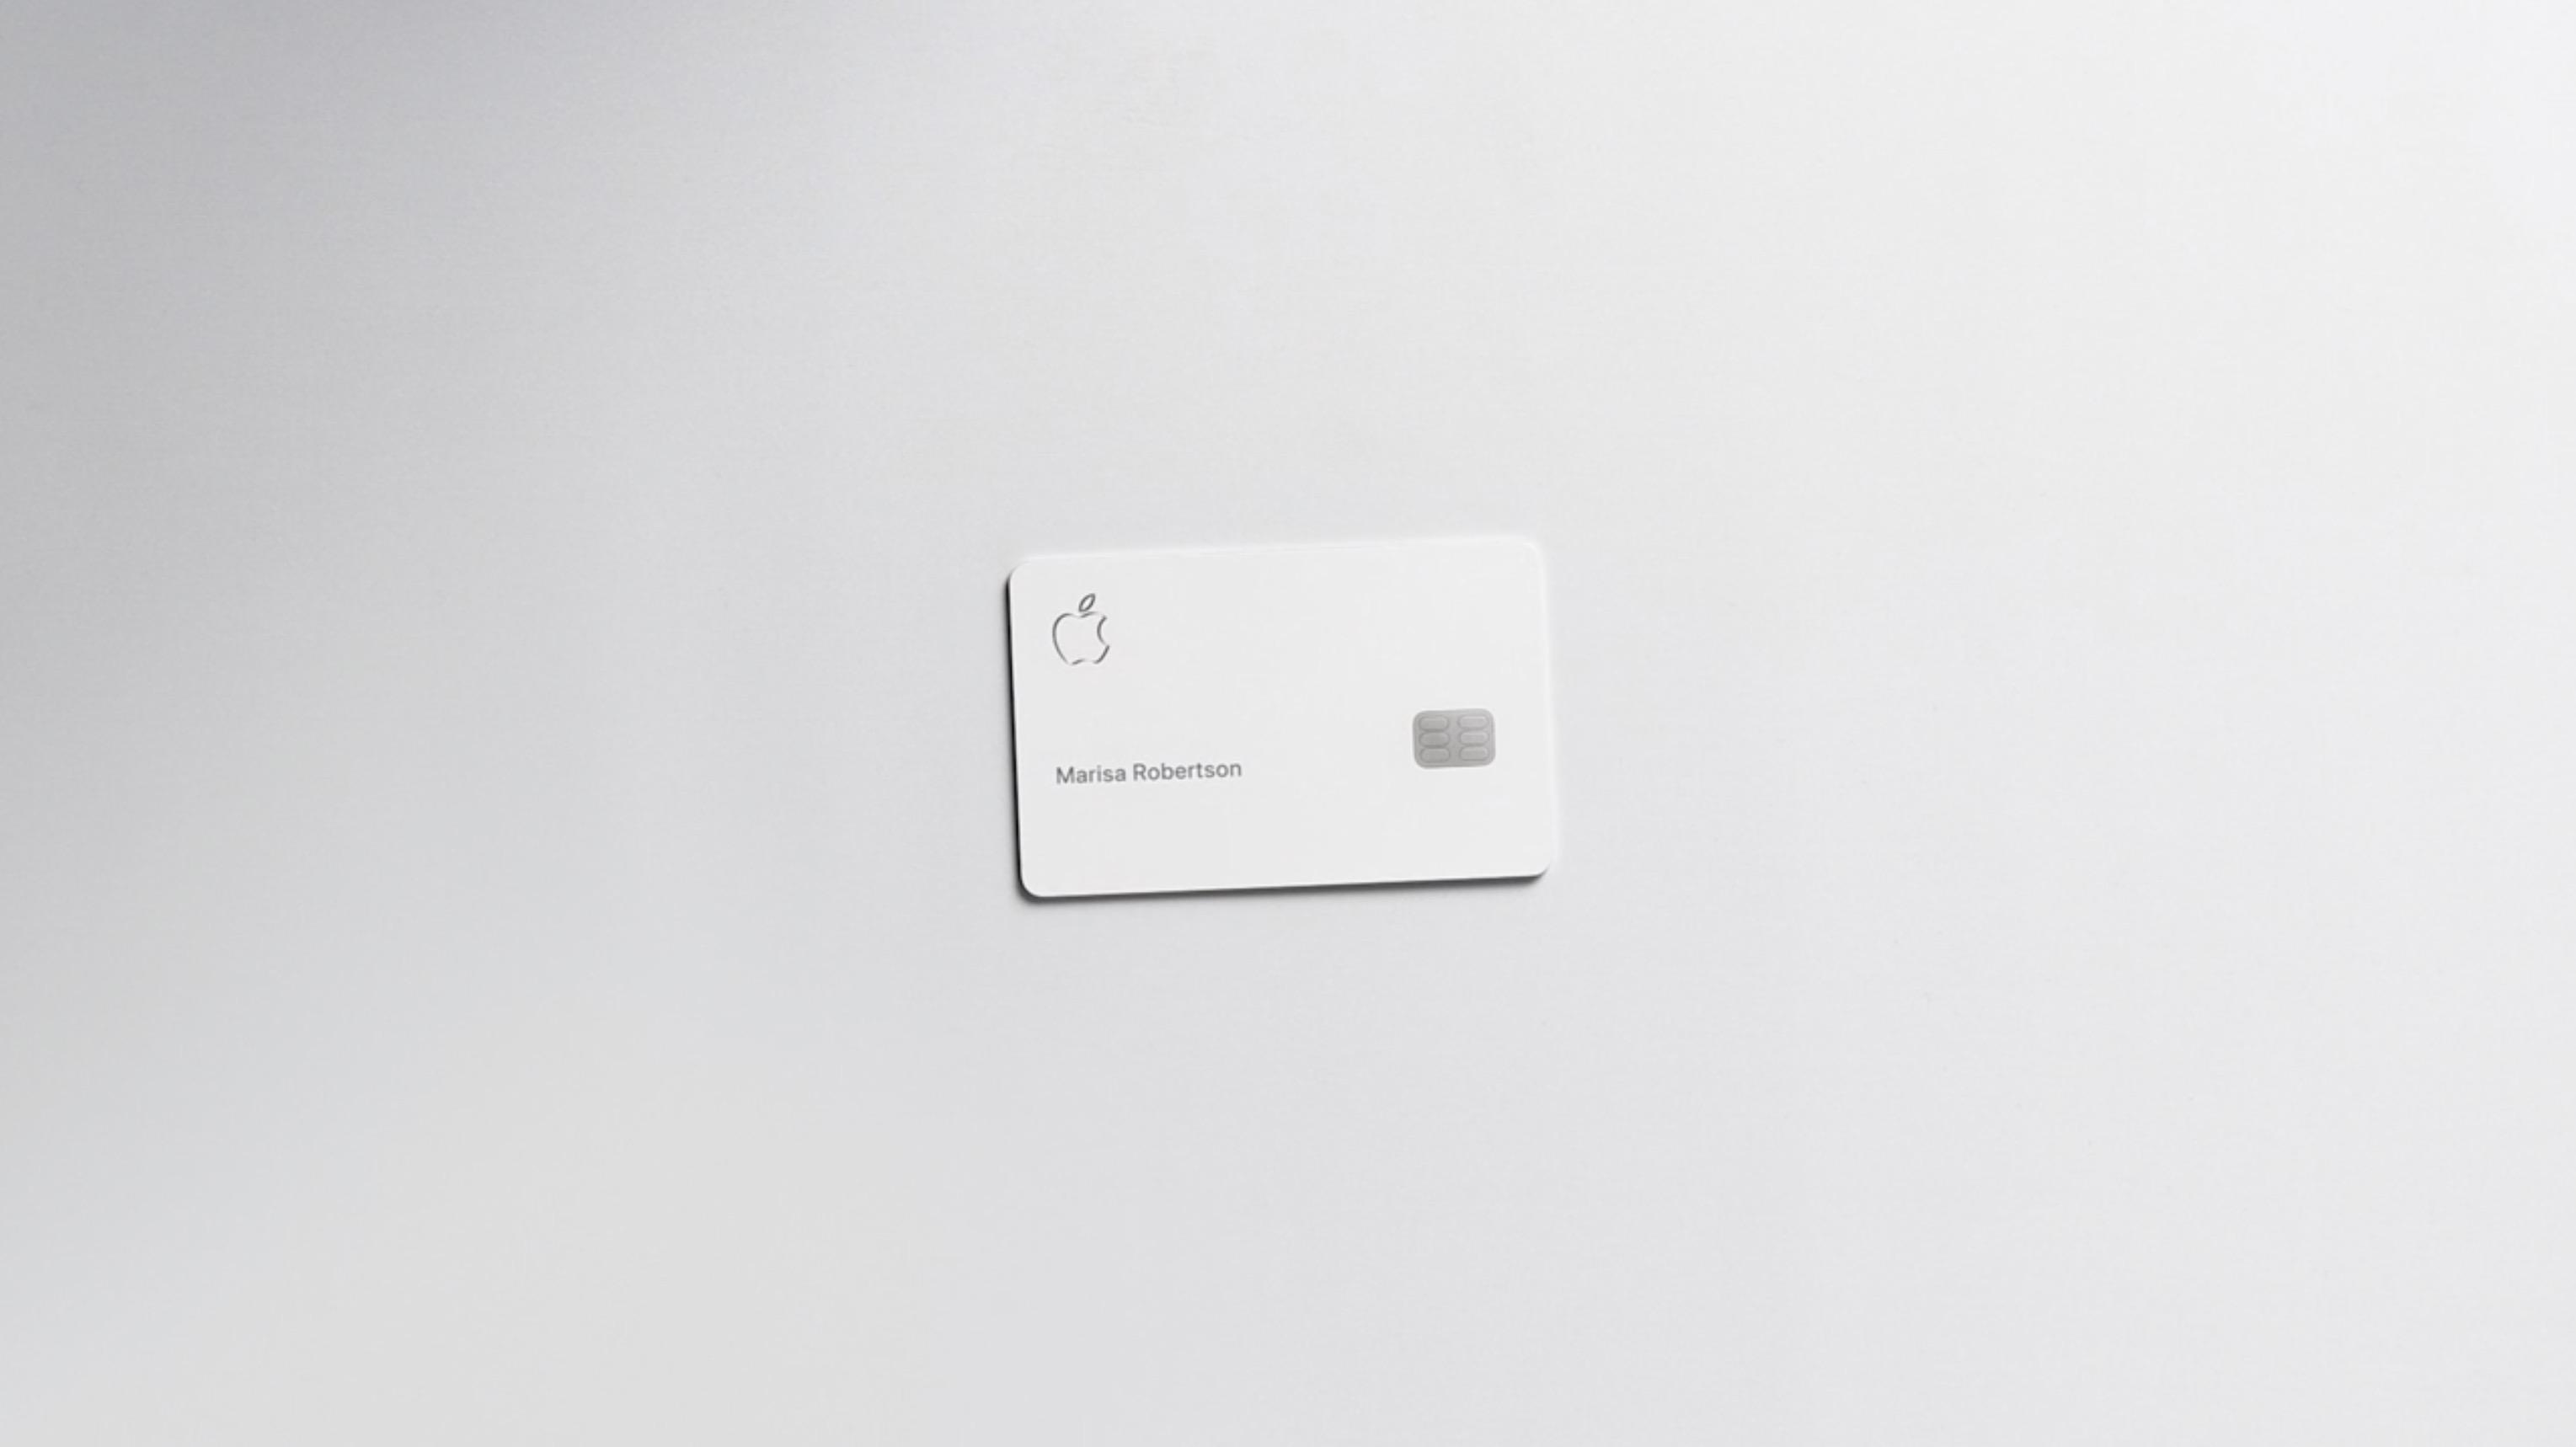 It s titanium, has no number, no signature, no CVV code. Here s the Apple Card